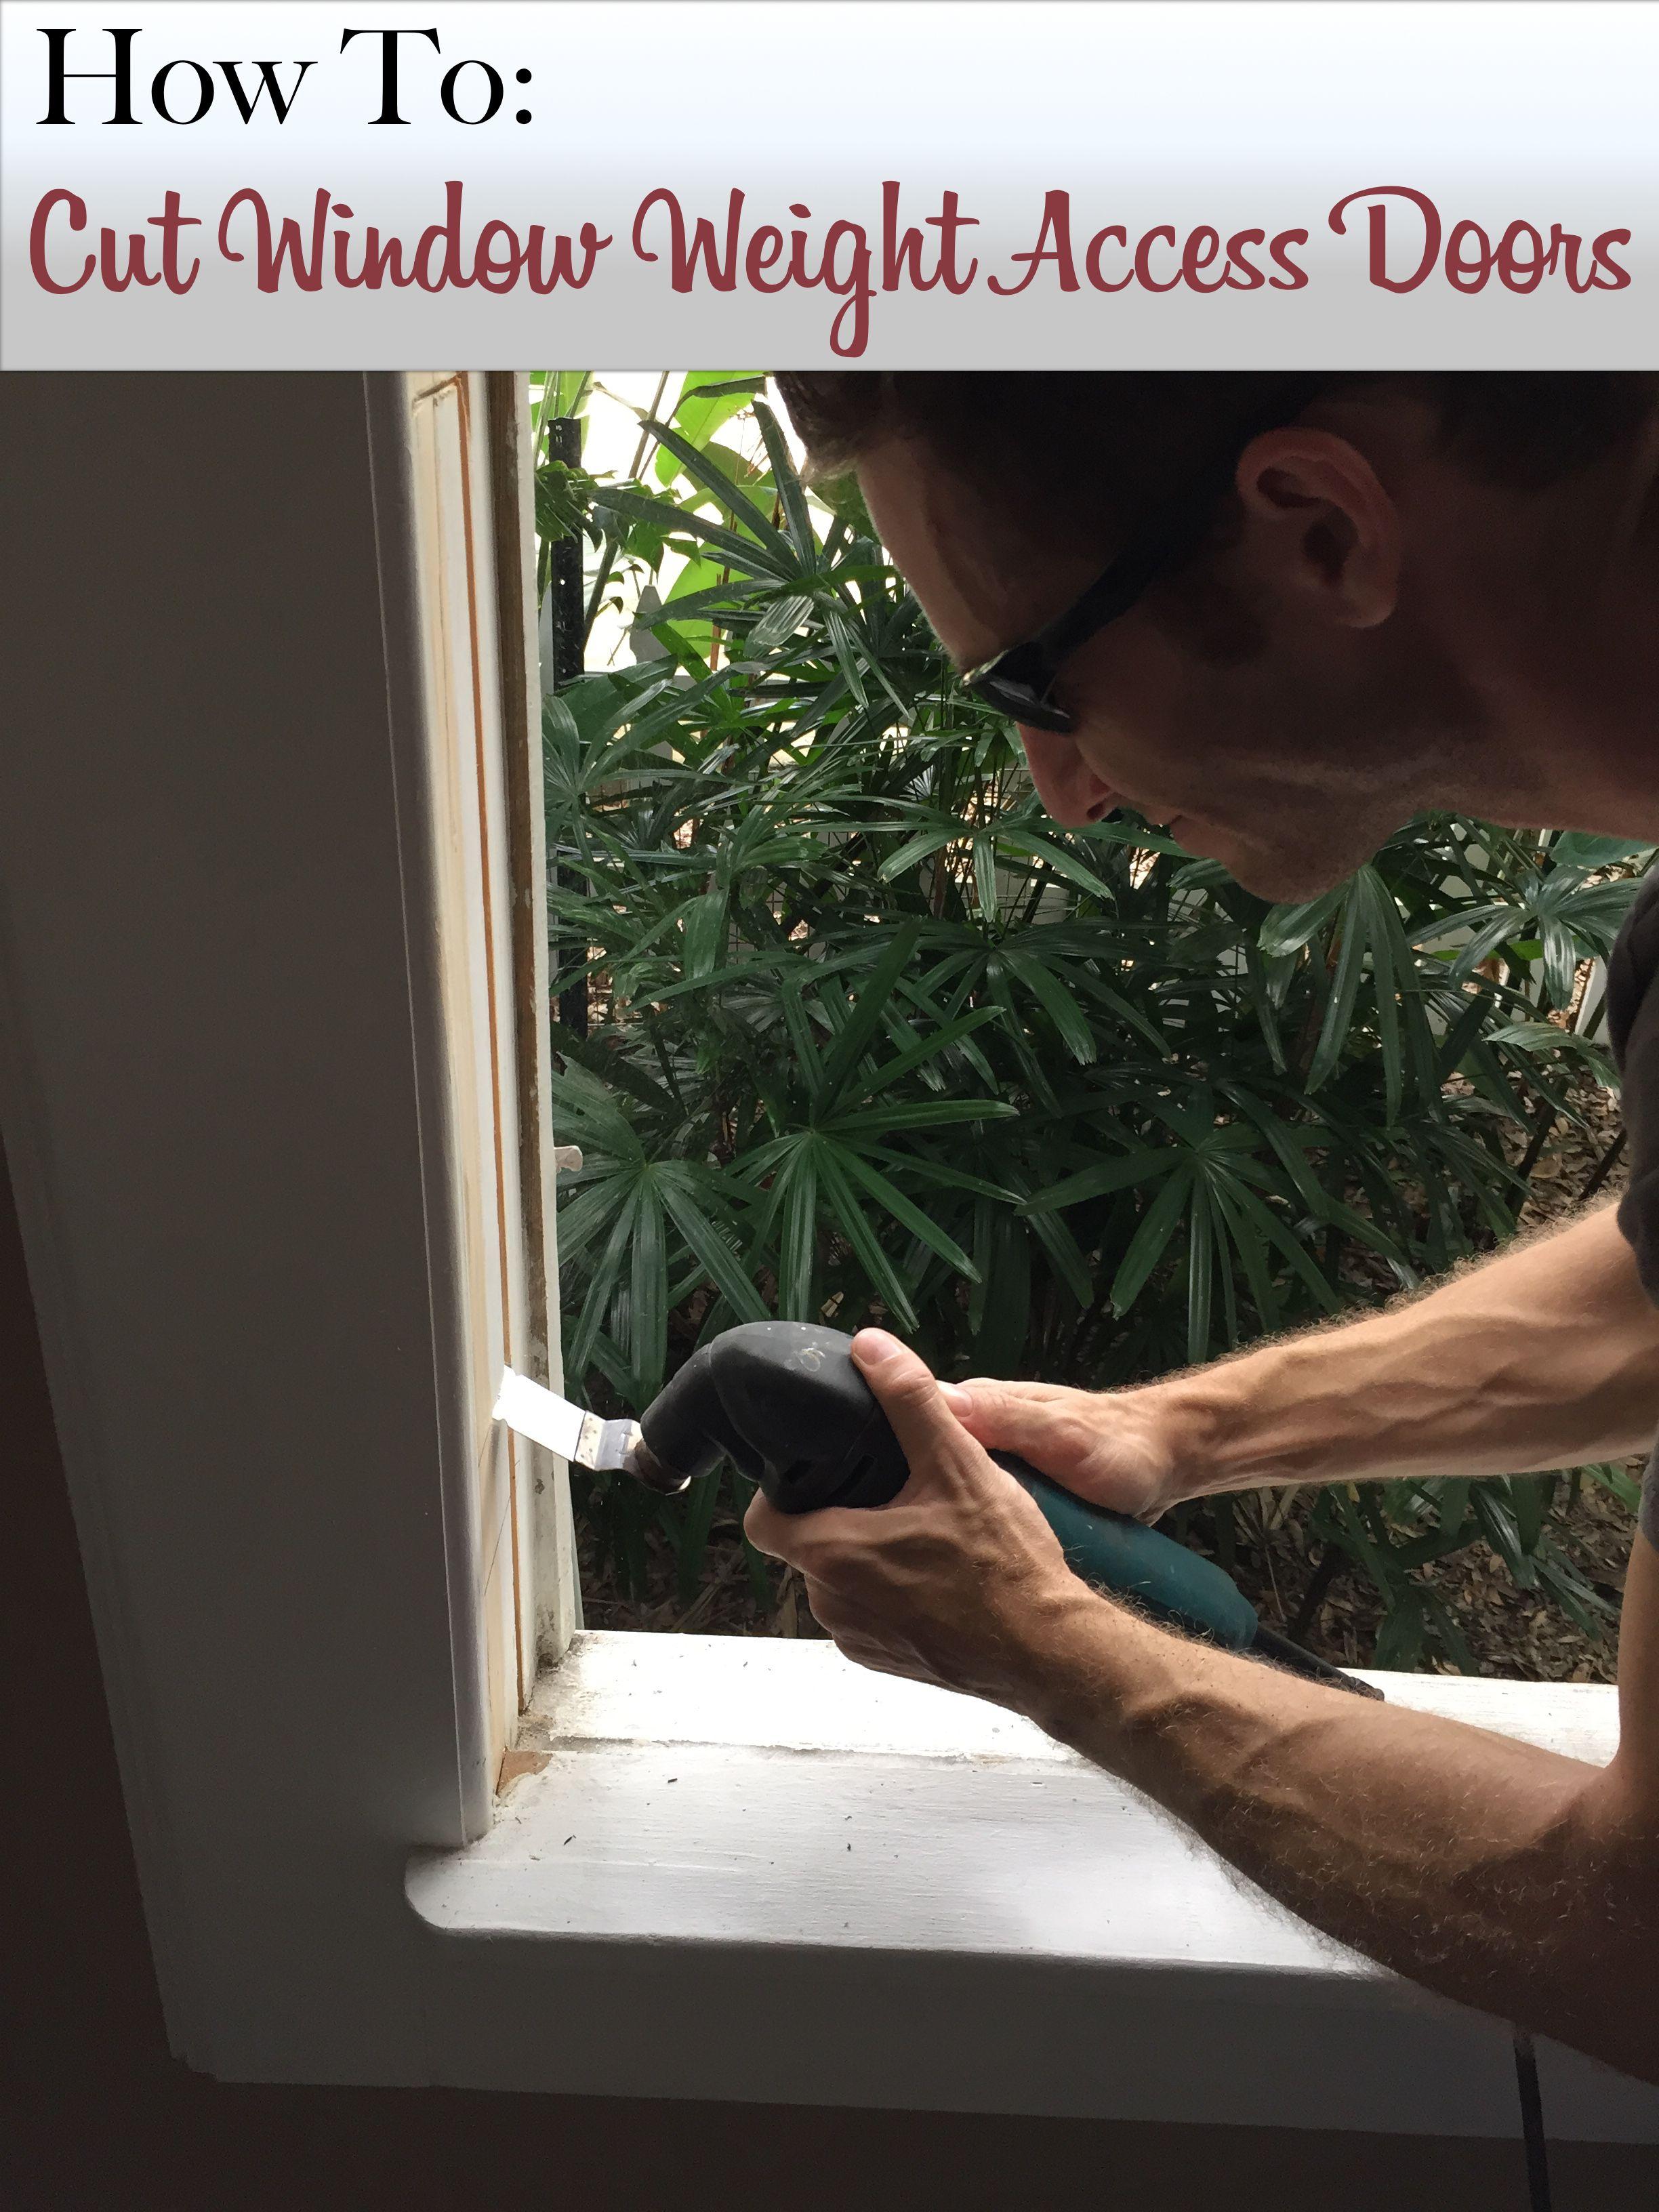 How To Cut Window Weight Access Doors Diy How To Pinterest